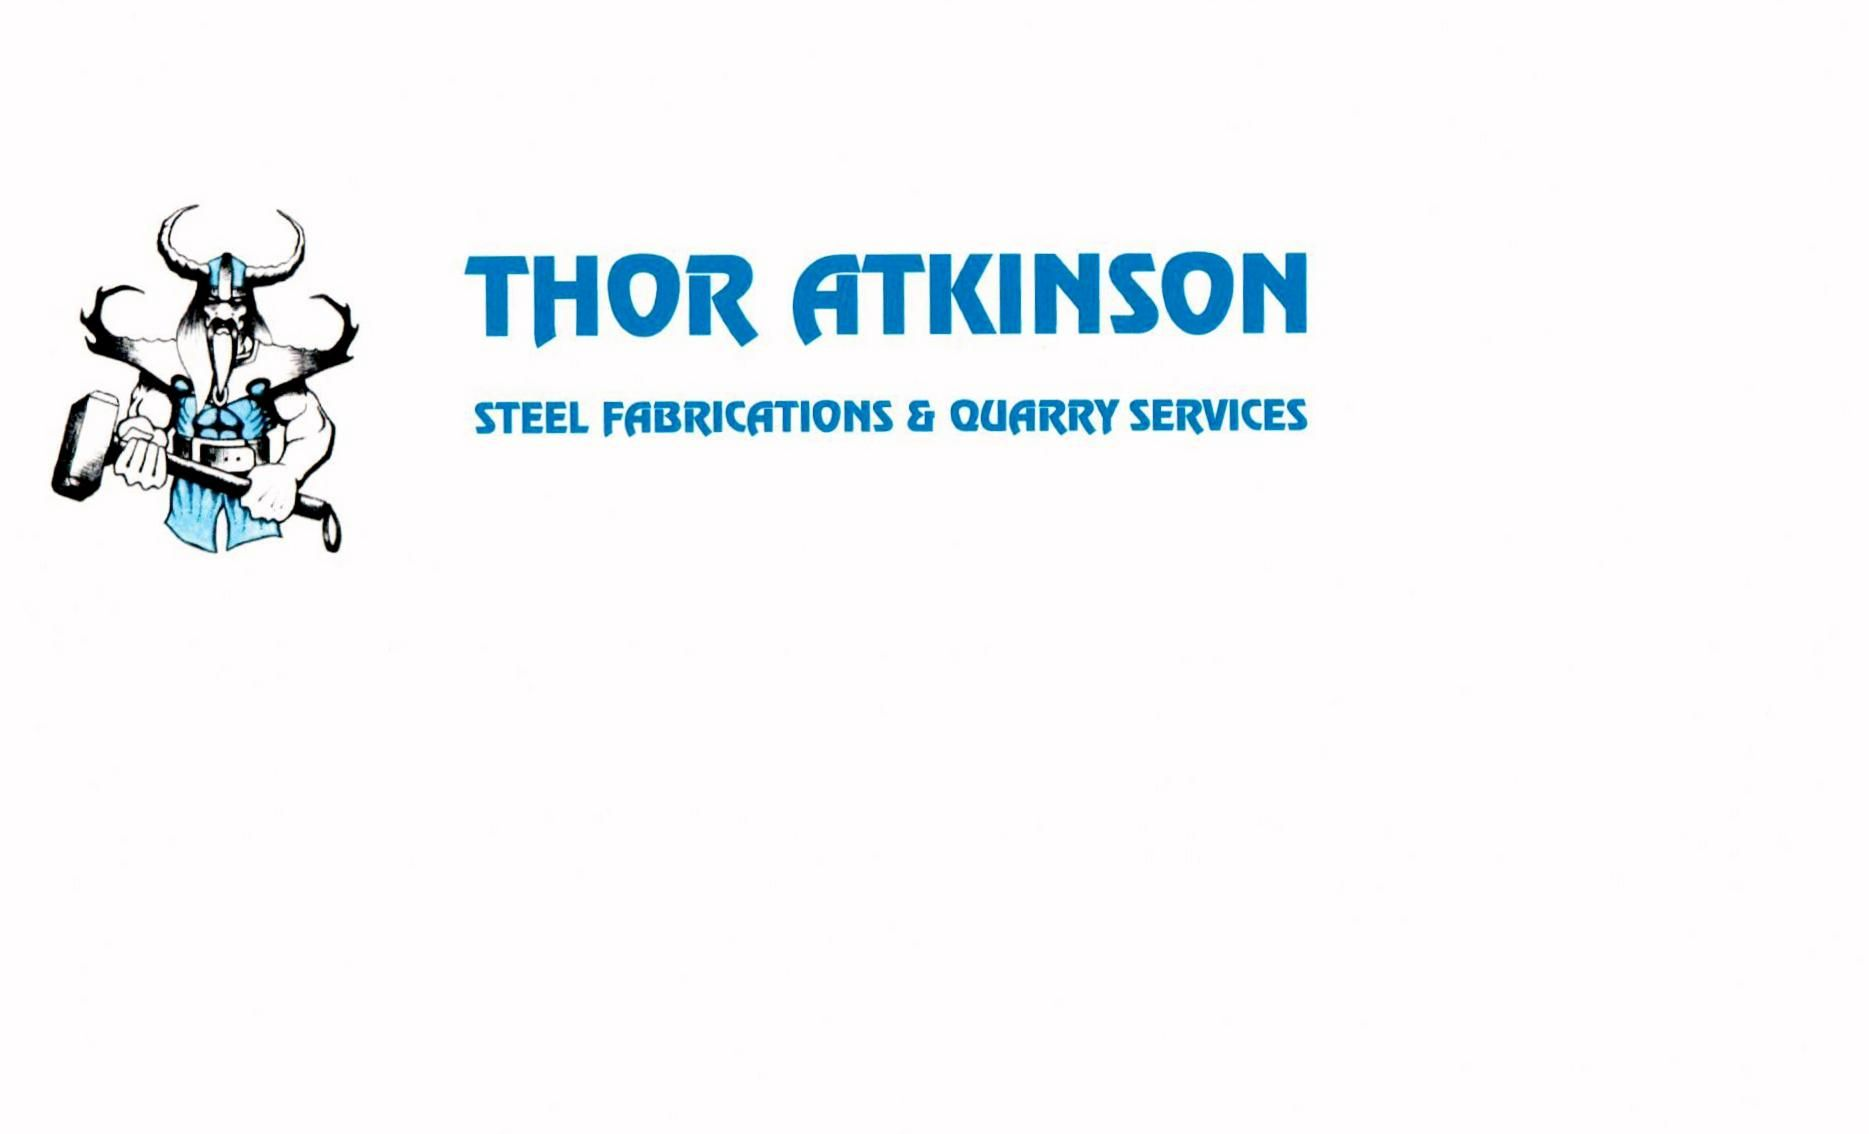 Thor Atkinson Steel Fabrications Ltd